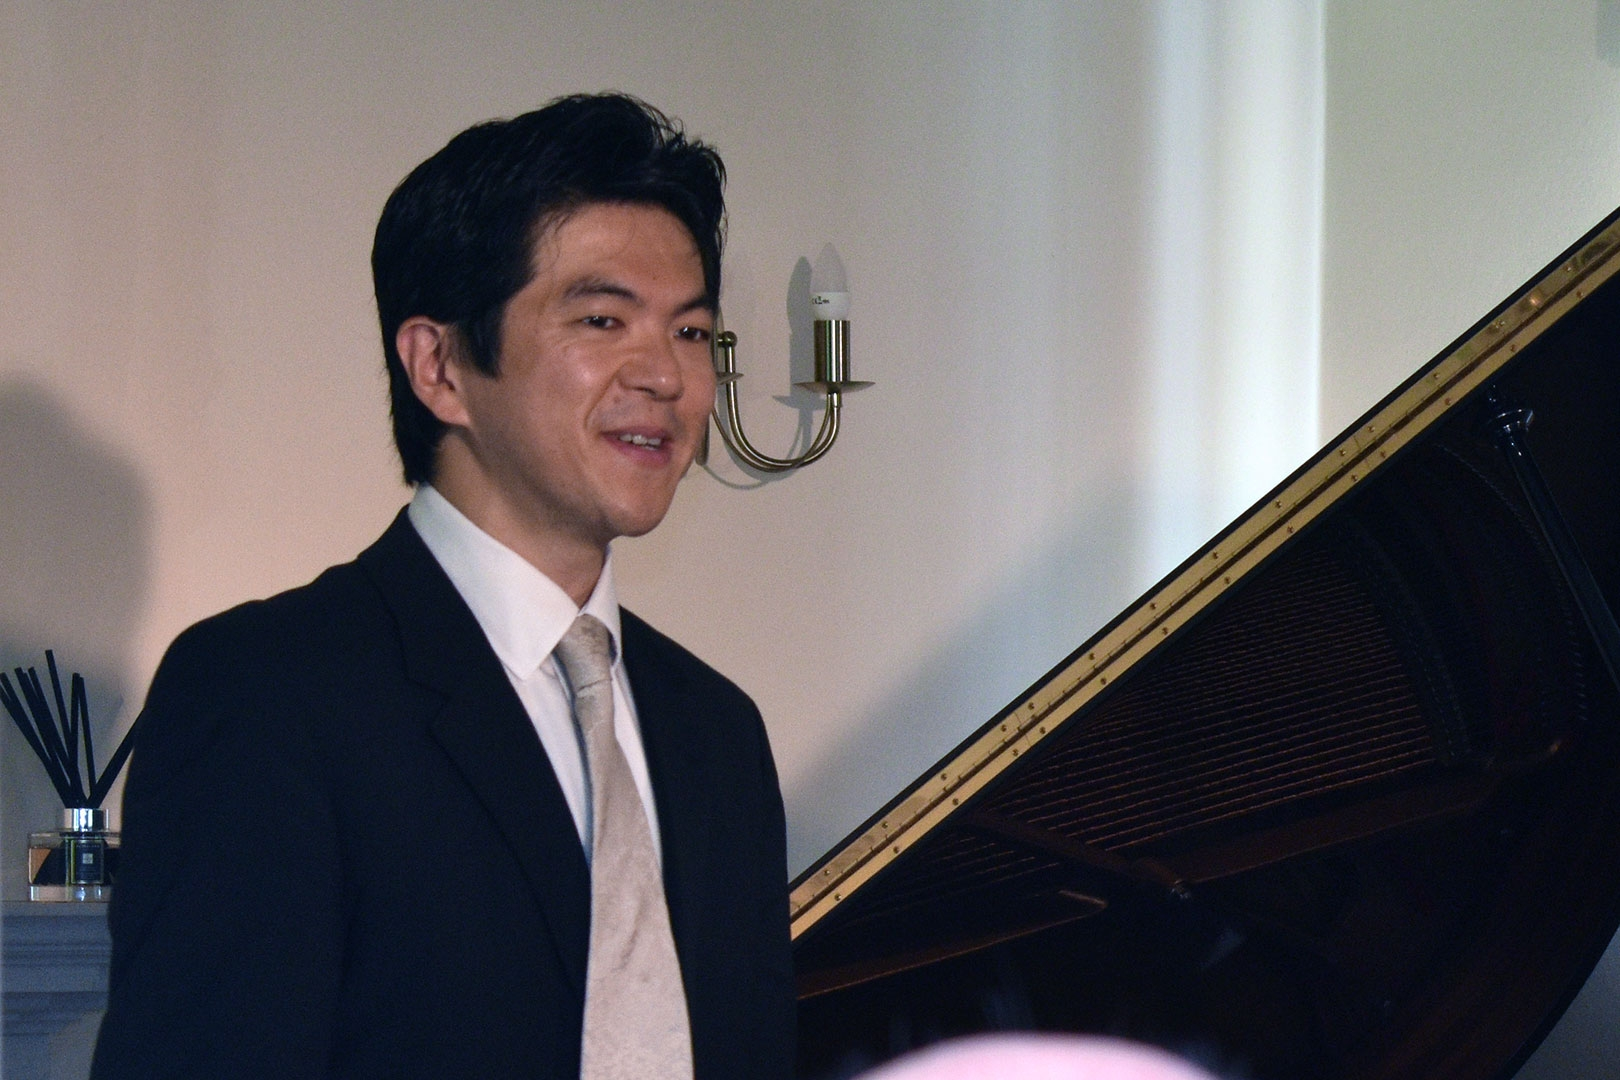 Masayuki Tayama at Breinton on 15 September